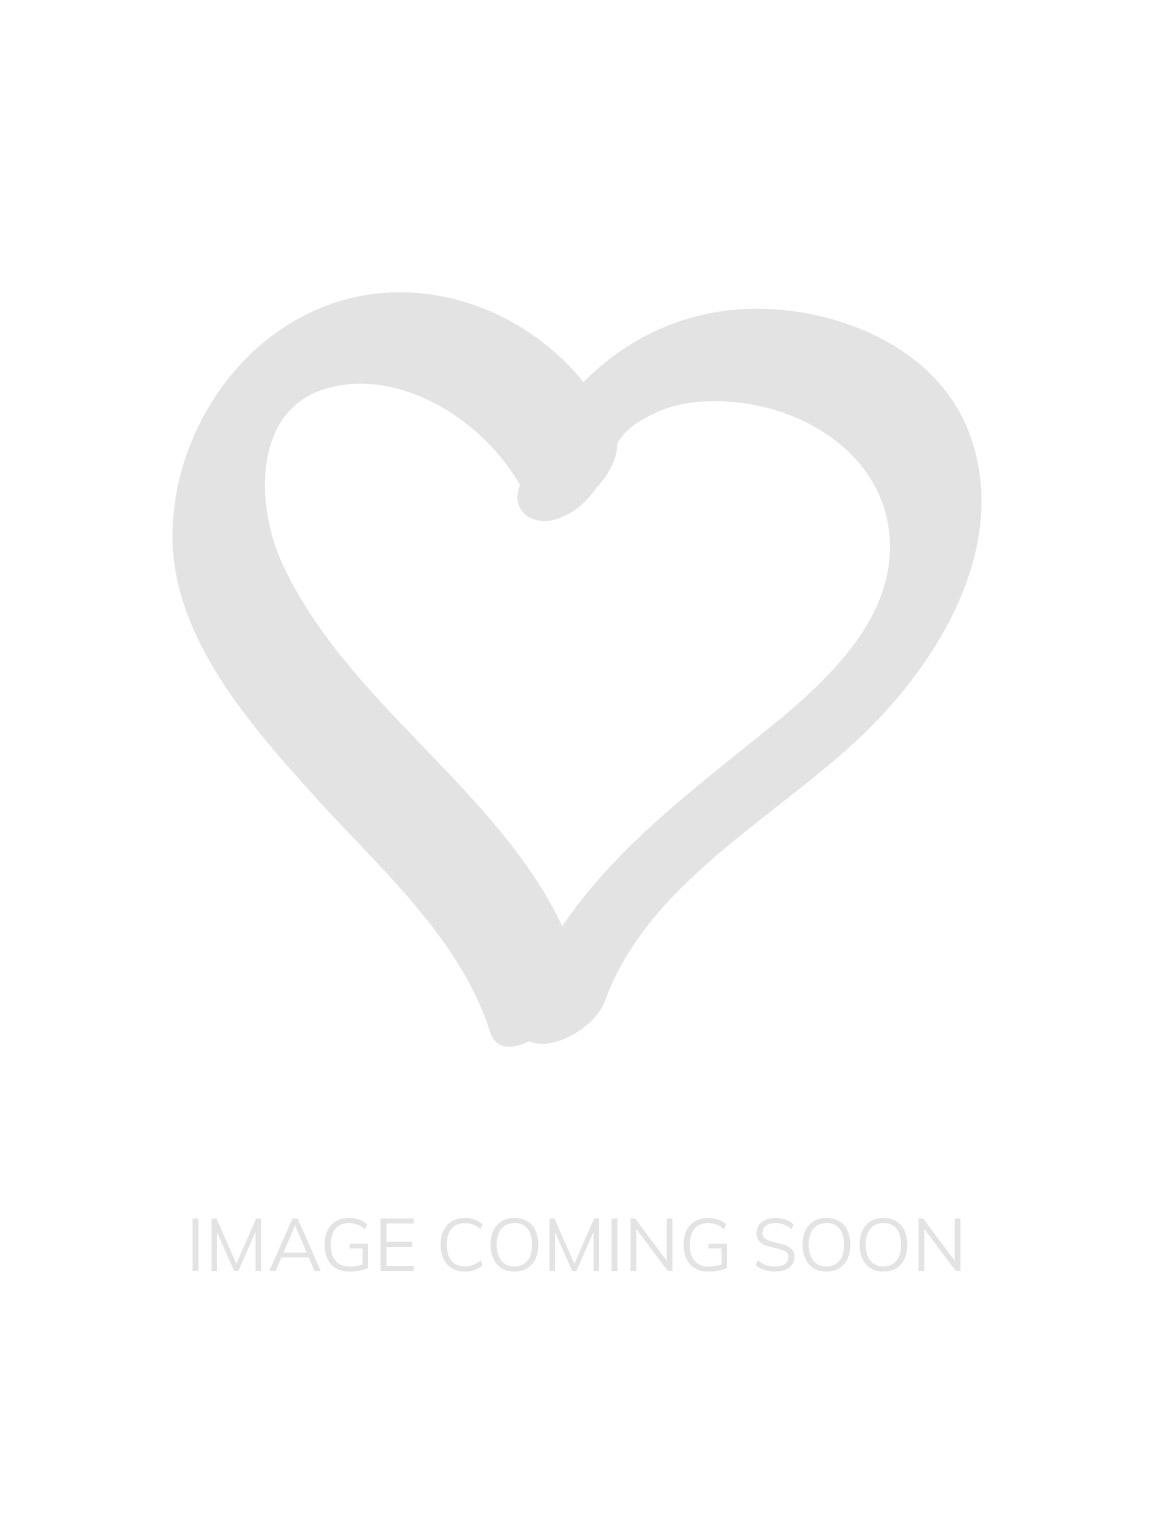 0db14042c580e Bridal Bouquet Strapless Multiway Bra - Ivory